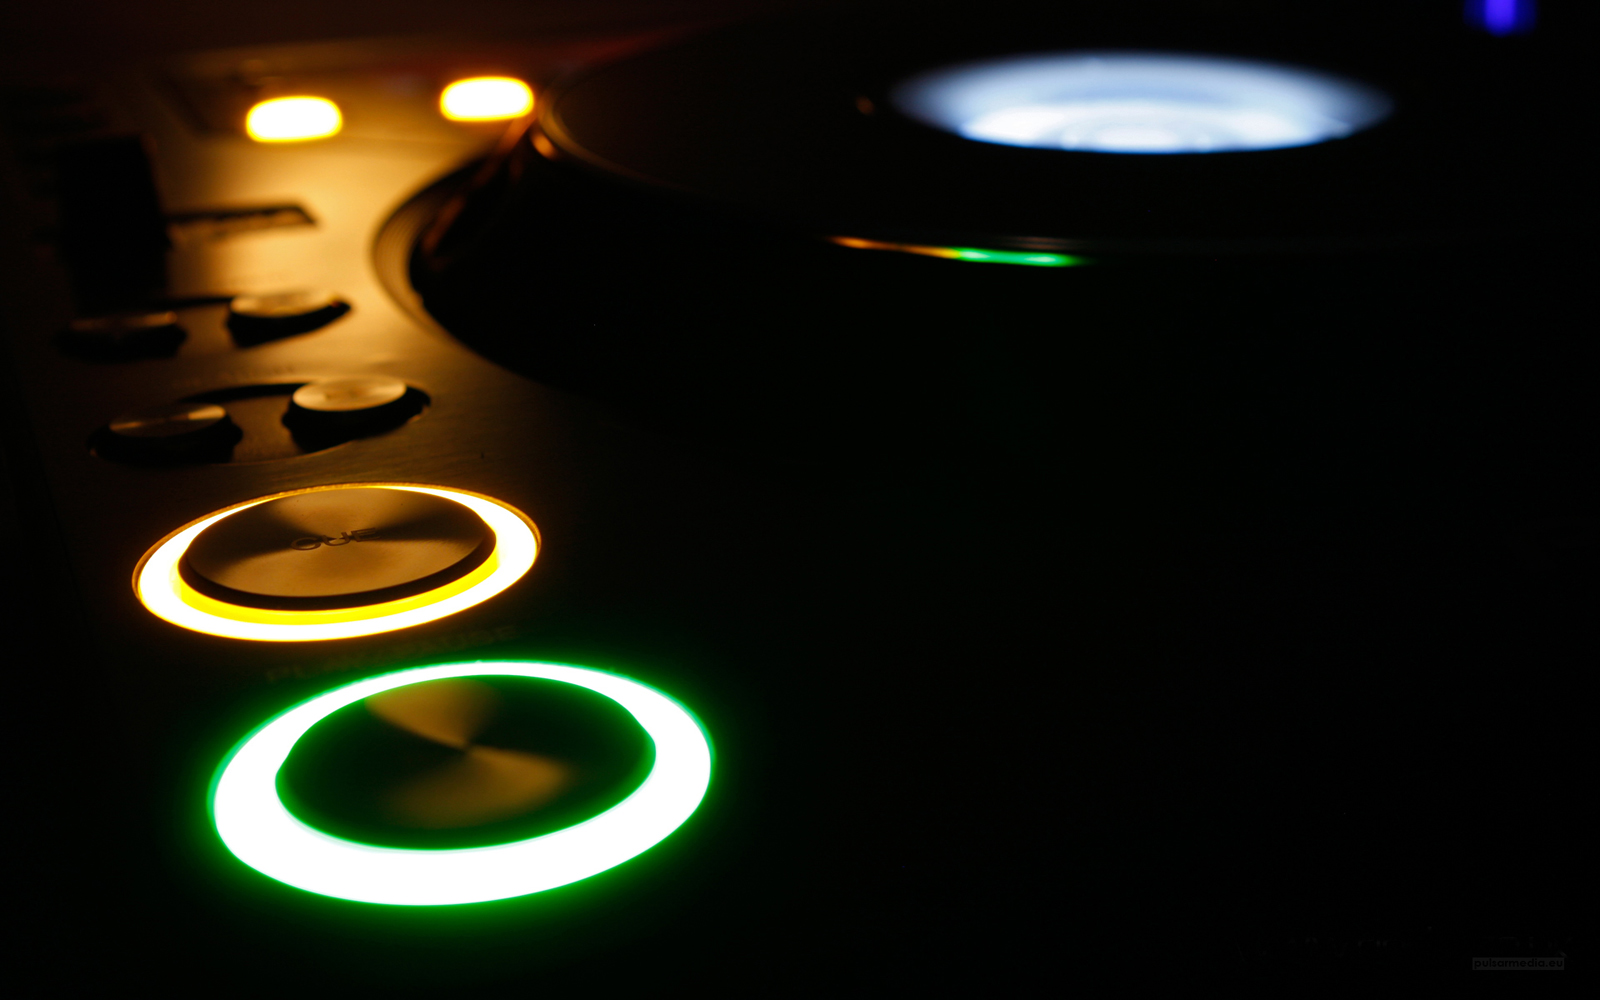 http://4.bp.blogspot.com/-hiiqtdHK5s8/Too8HRo7ltI/AAAAAAAABdc/dc05HHngPzo/s1600/Music_DJs_Dark_Turntable_Vinyl_HD_Wallpapers_Vvallpaper.net.jpg